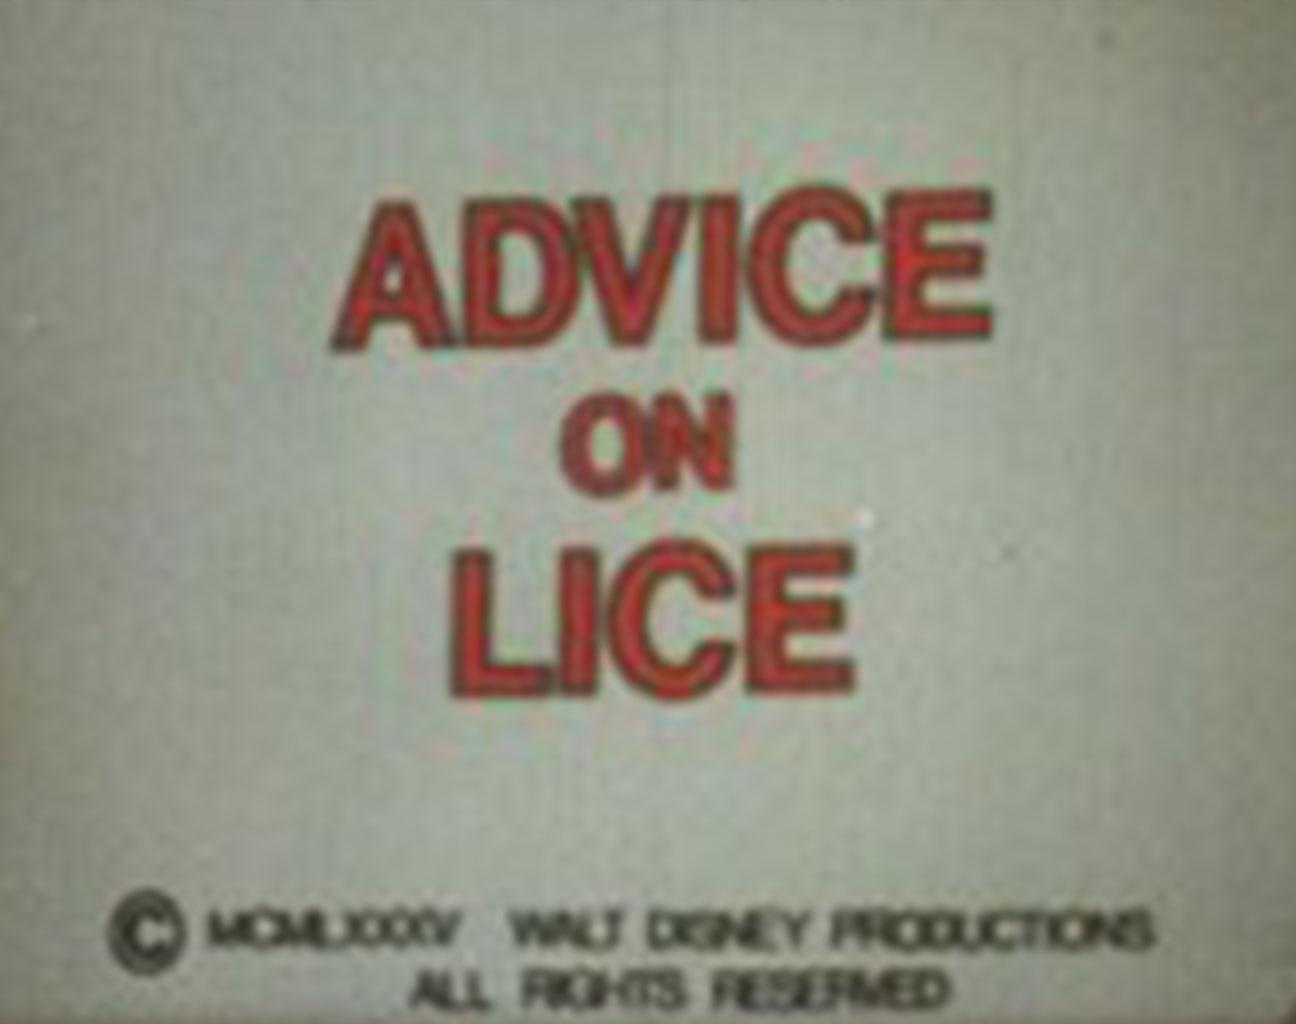 affiche poster advice lice disney